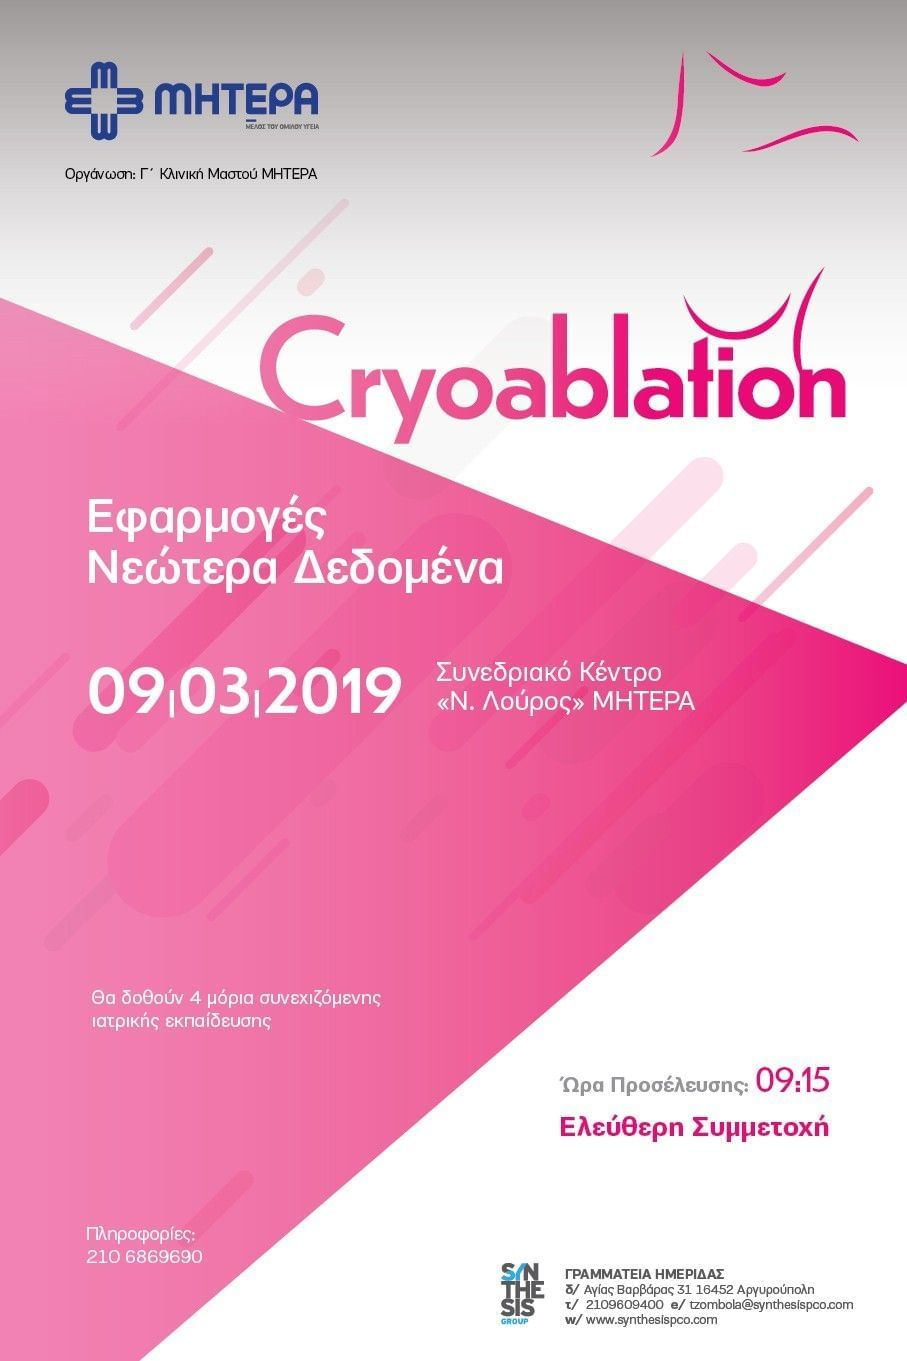 CRYOABLATION: ΕΦΑΡΜΟΓΕΣ - ΝΕΩΤΕΡΑ ΔΕΔΟΜΕΝΑ